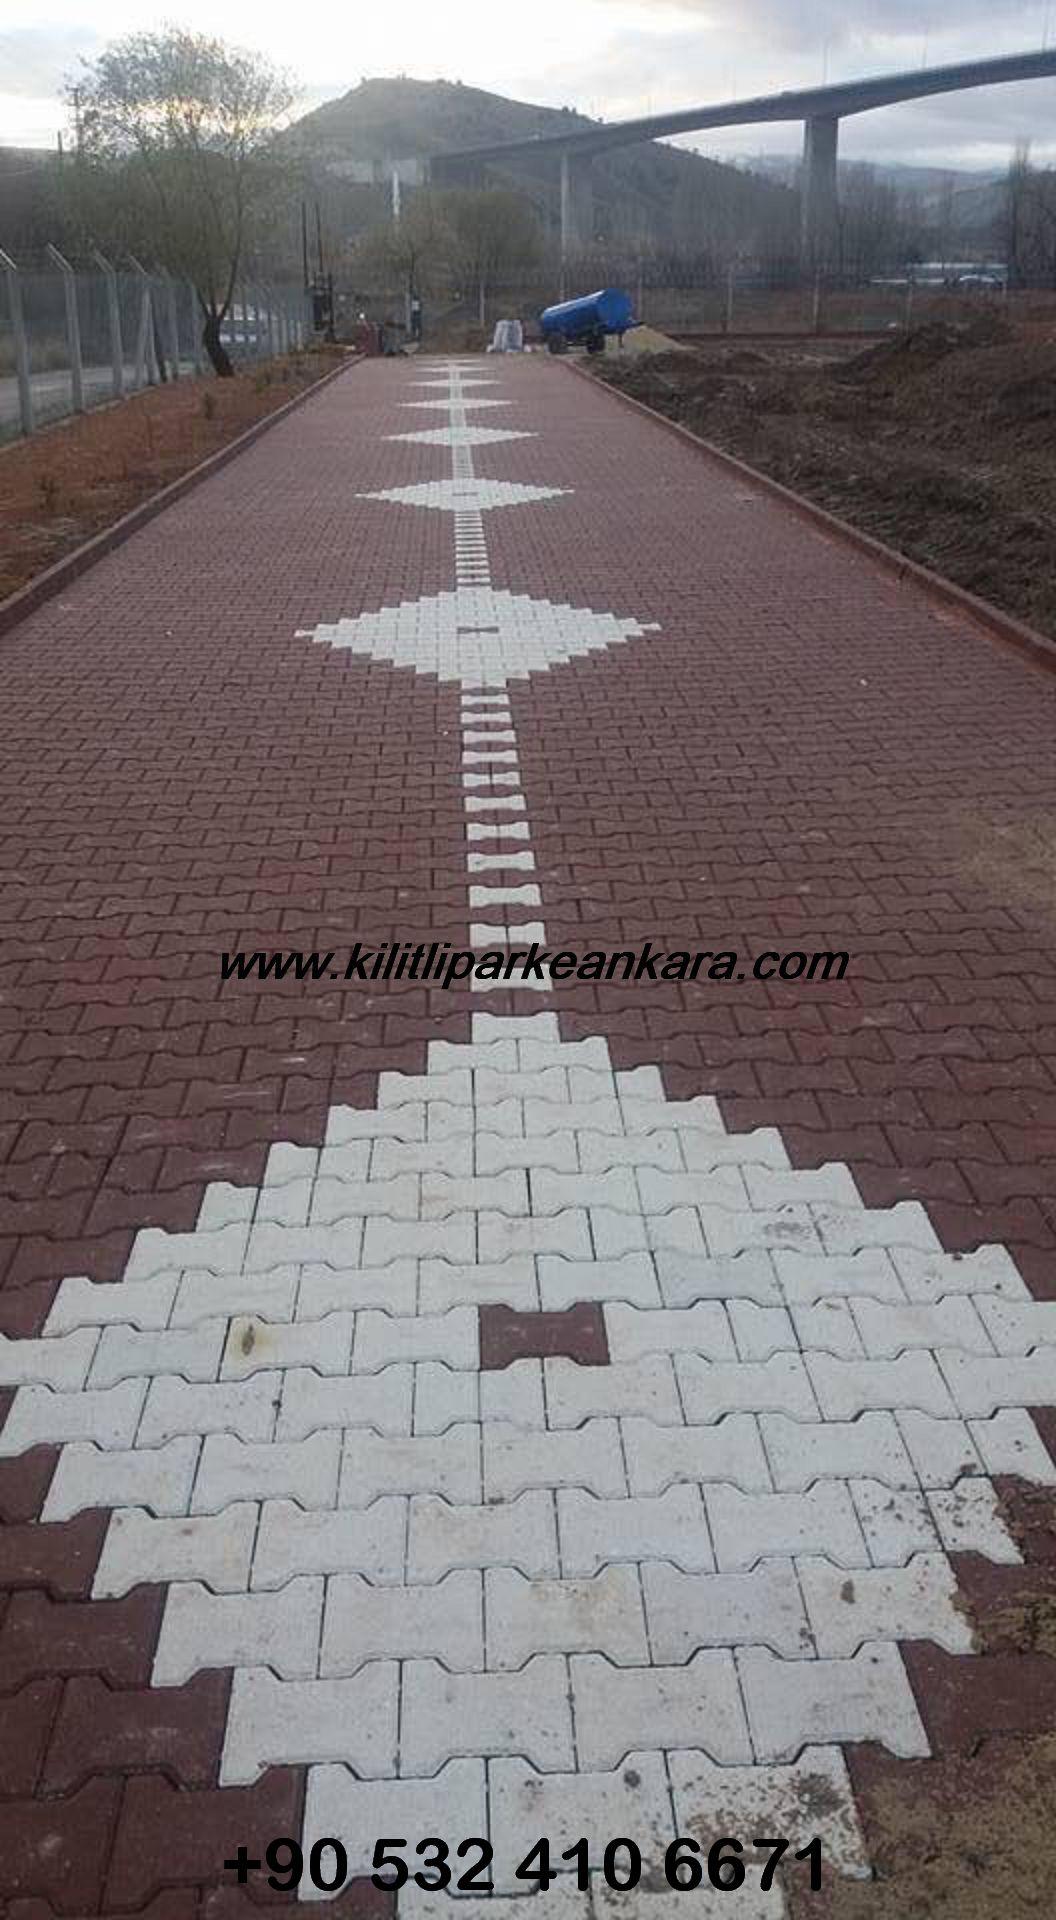 Ankara Kilit Taşı - Kilitli Parke Taşı Ustası (012)